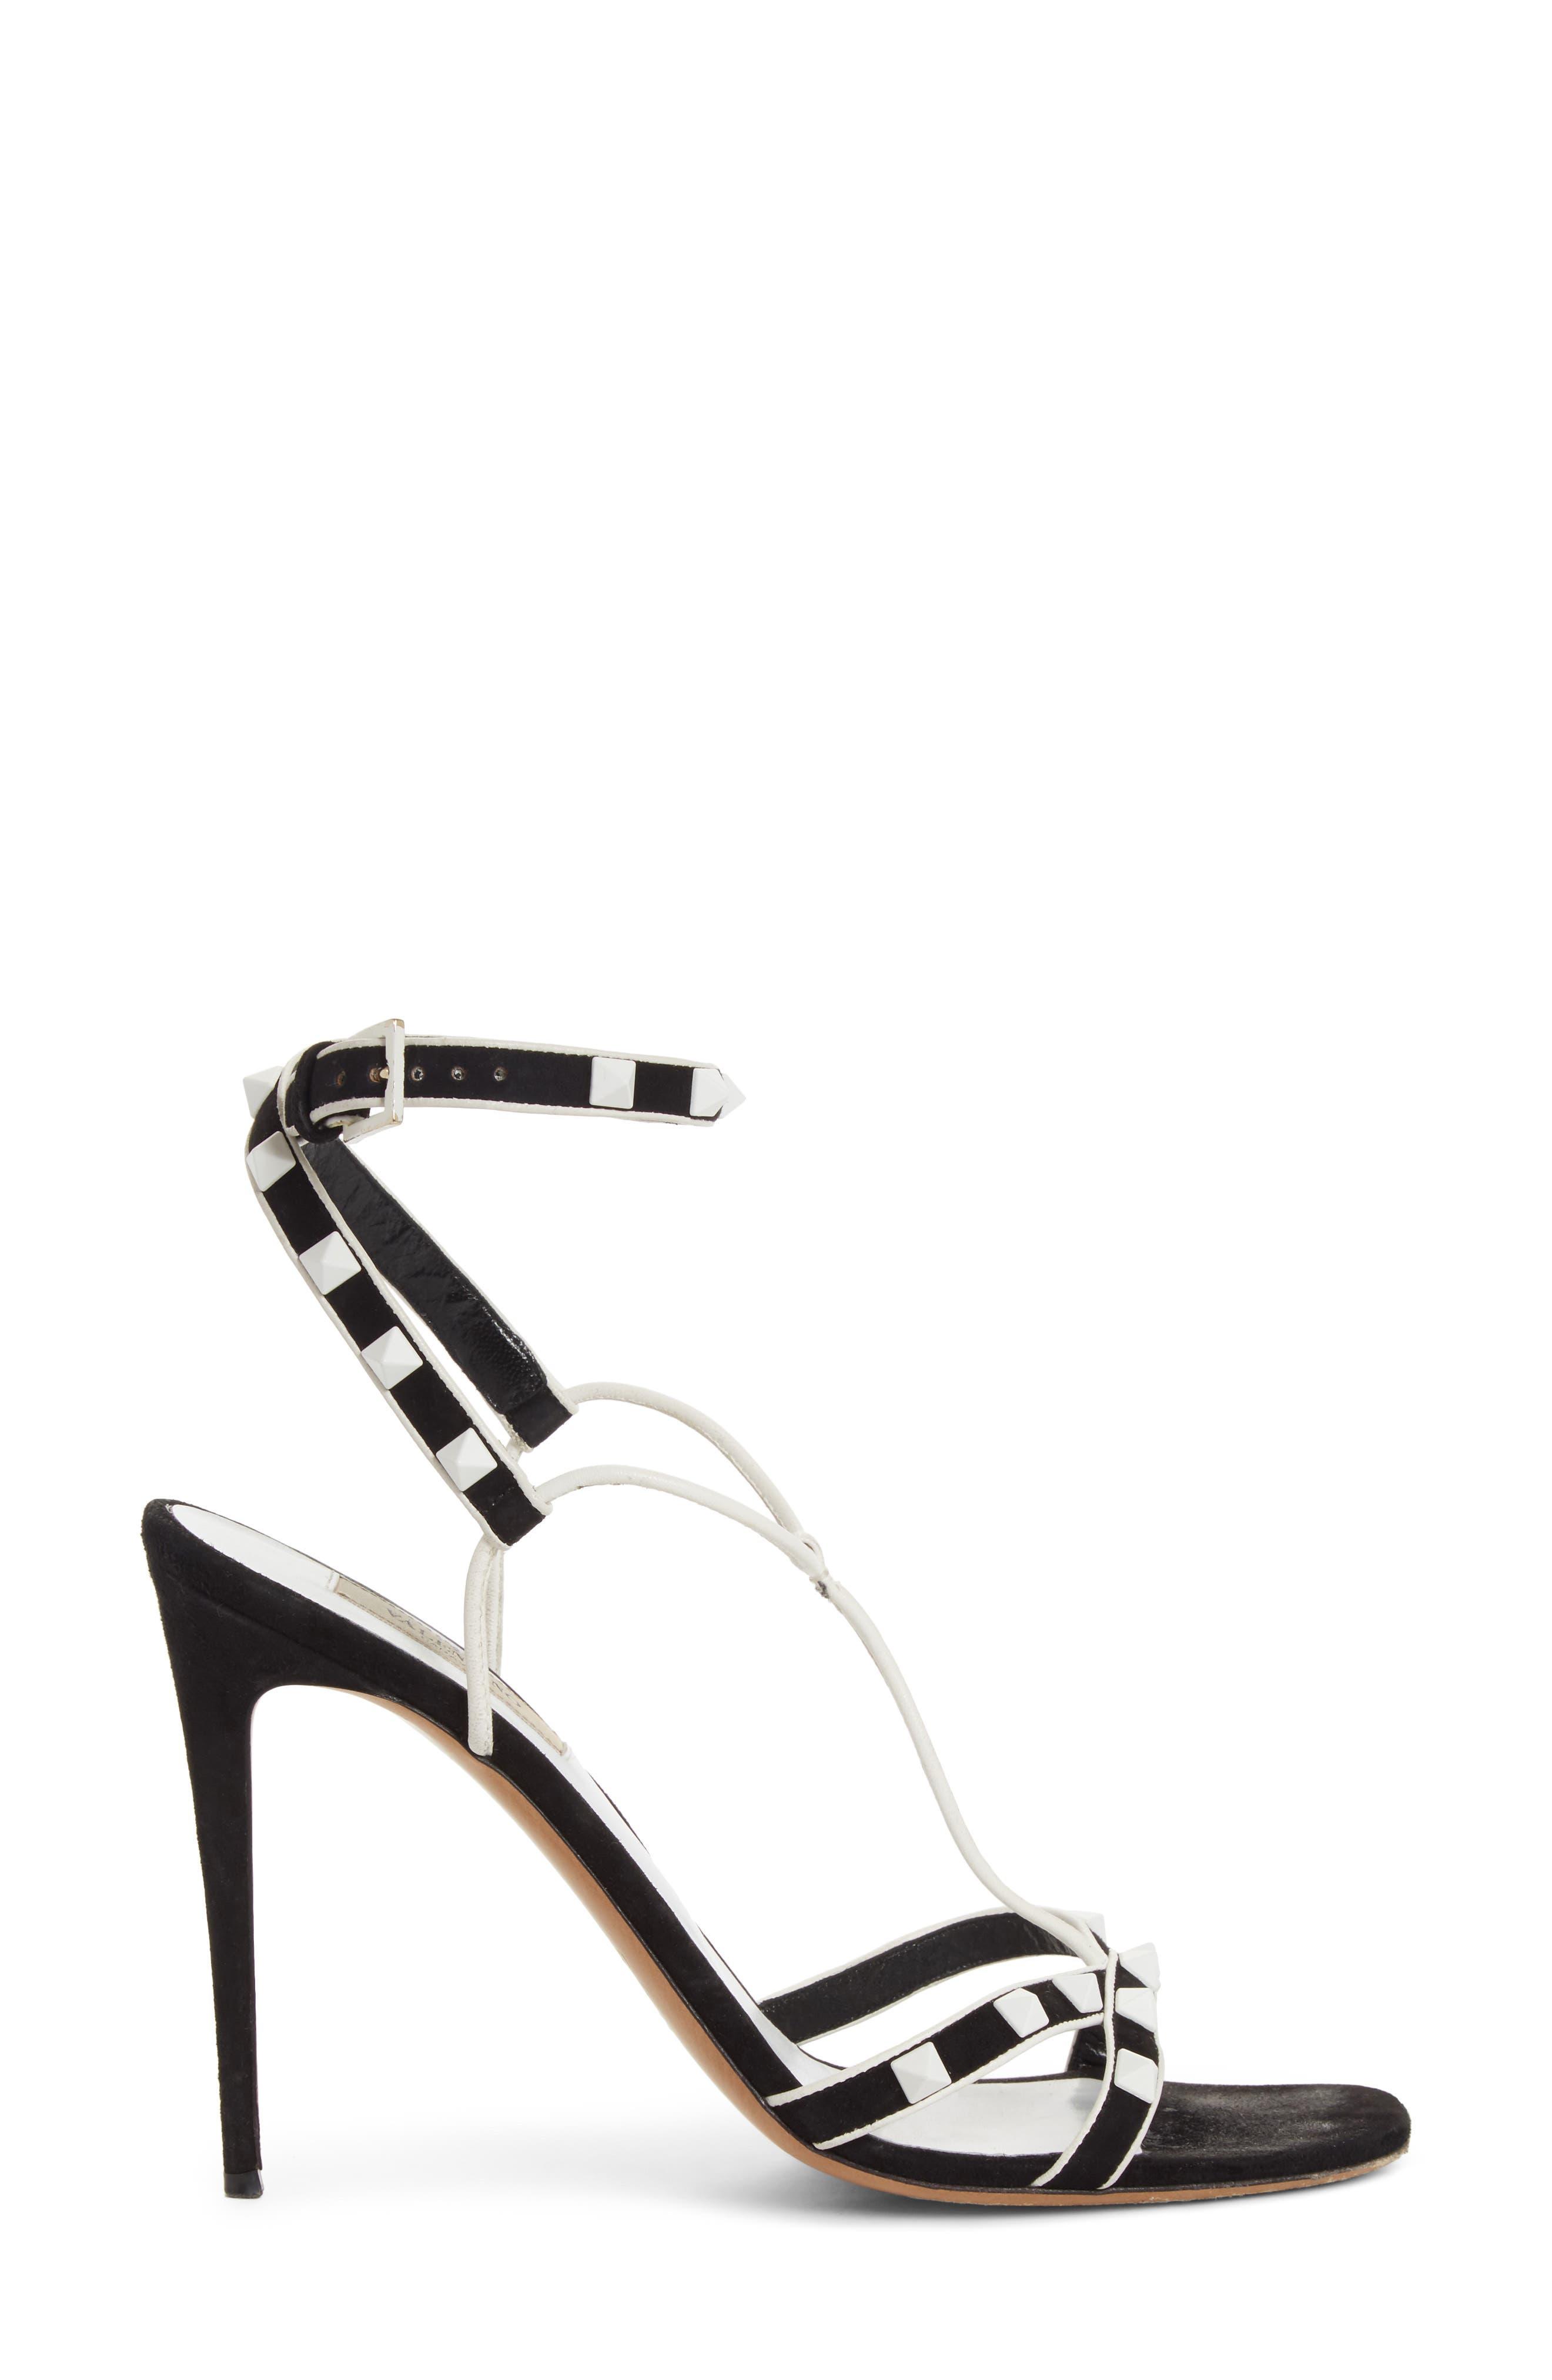 Valentino Free Rockstud T-Strap Sandal,                             Alternate thumbnail 3, color,                             Black/ White